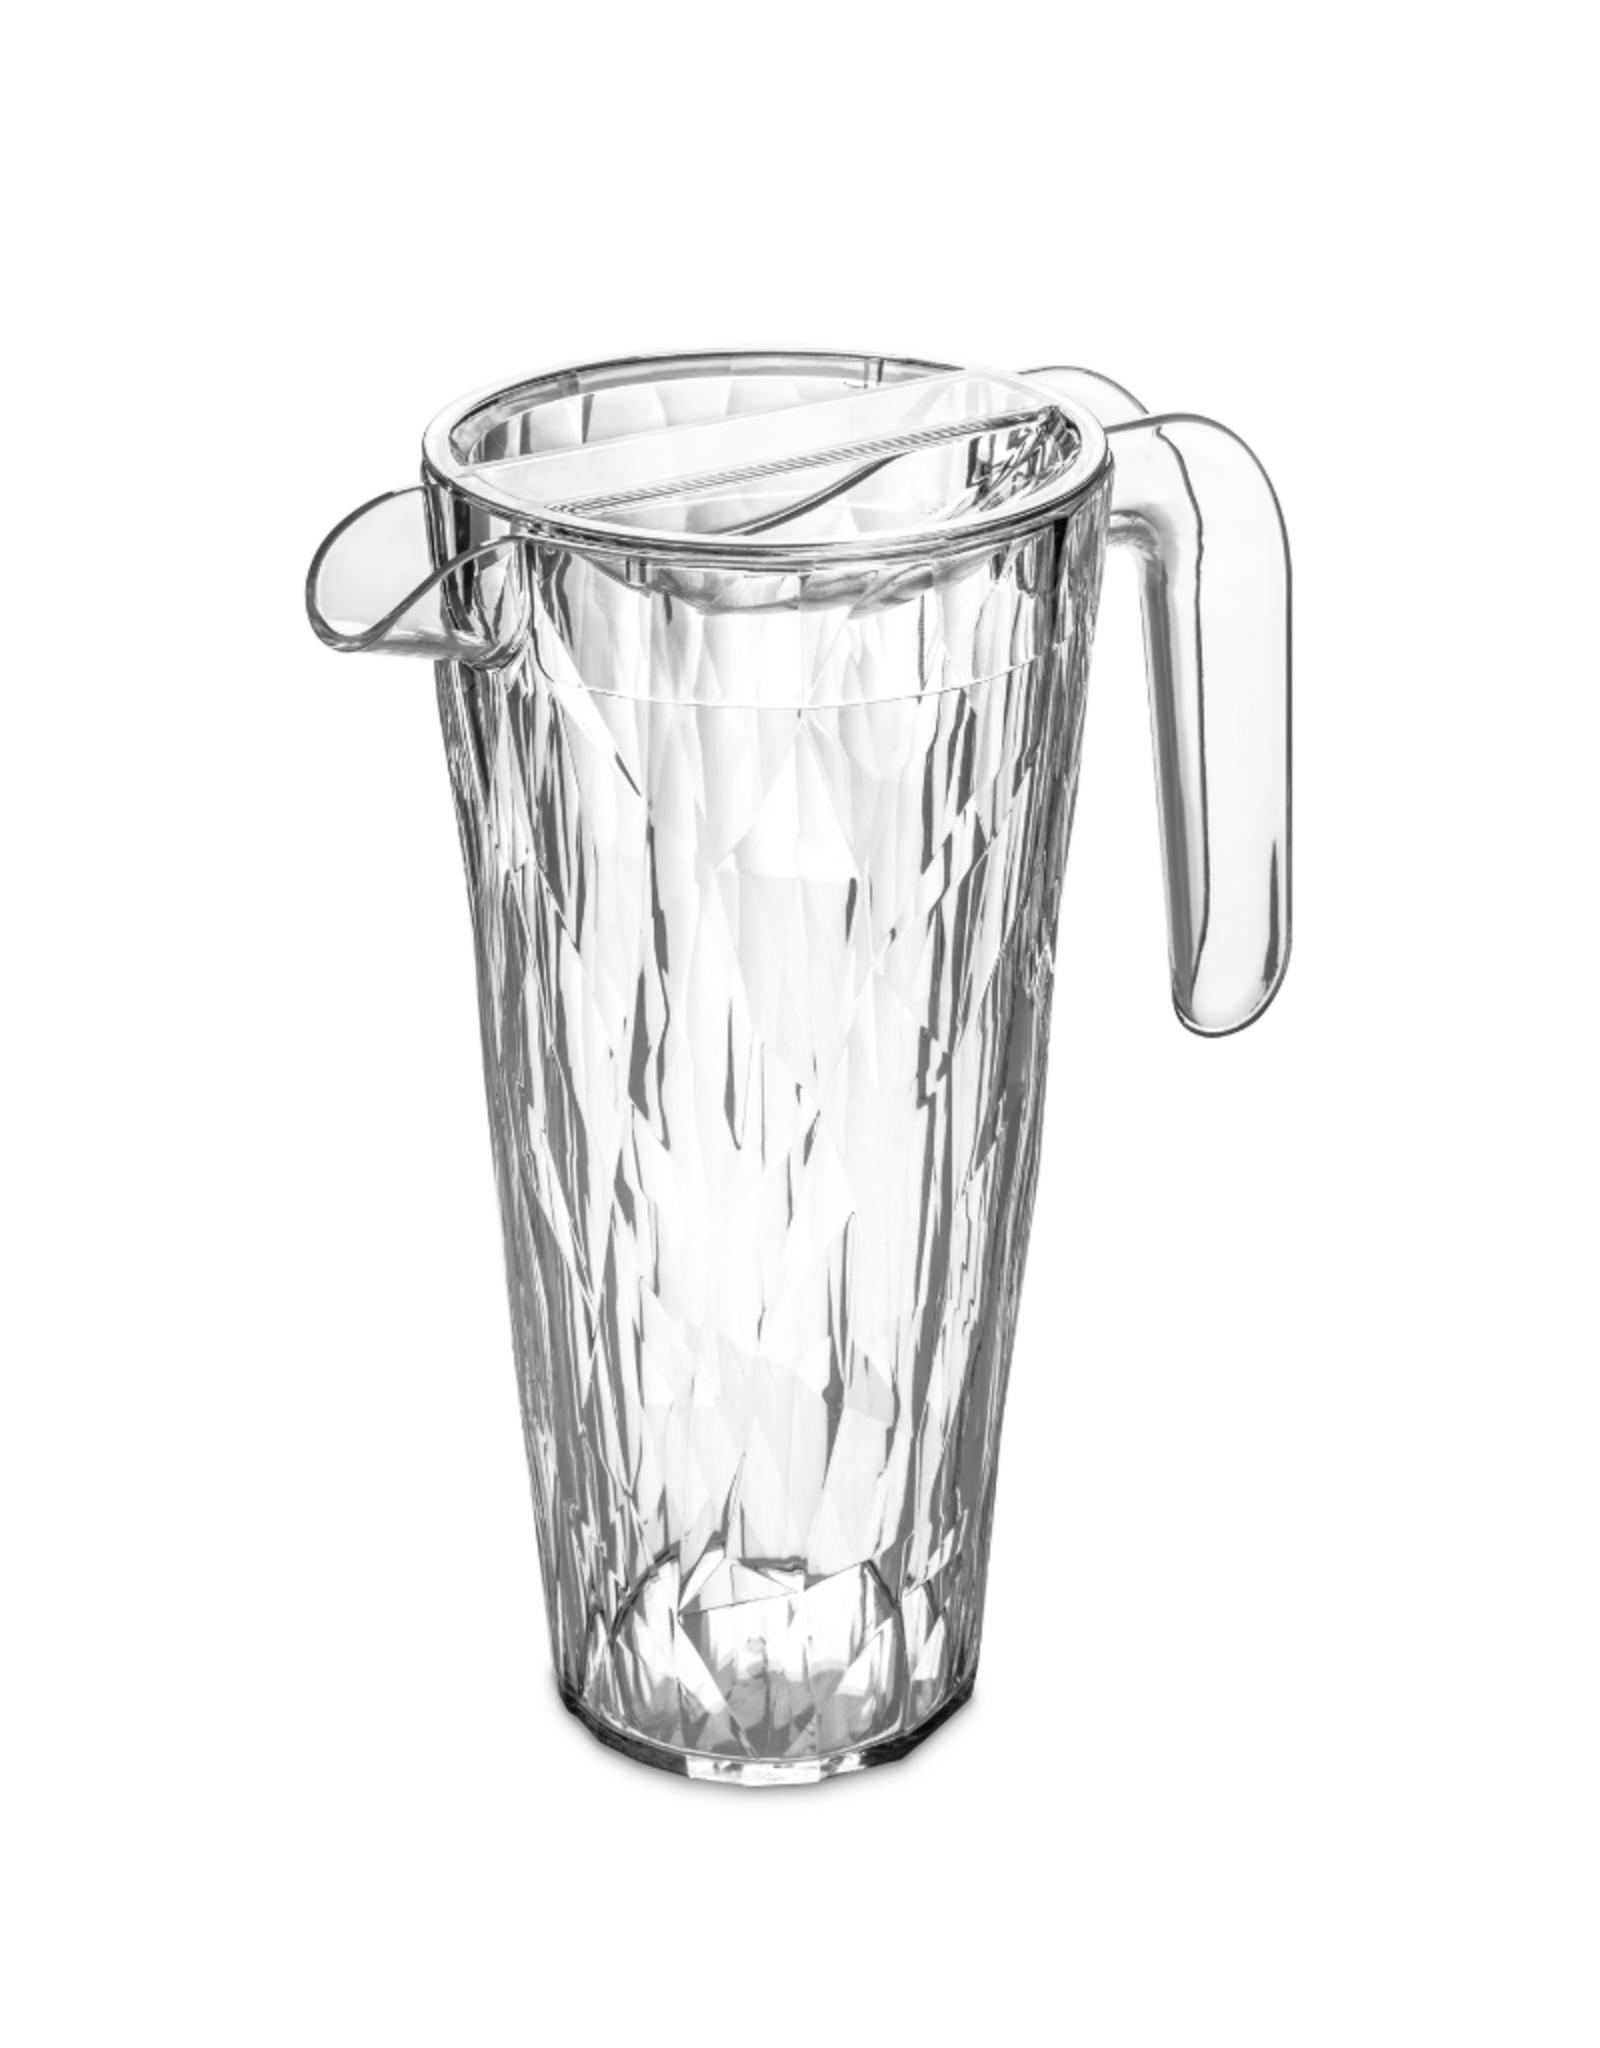 Koziol Pichet 1.5L 'Superglass' Club clair